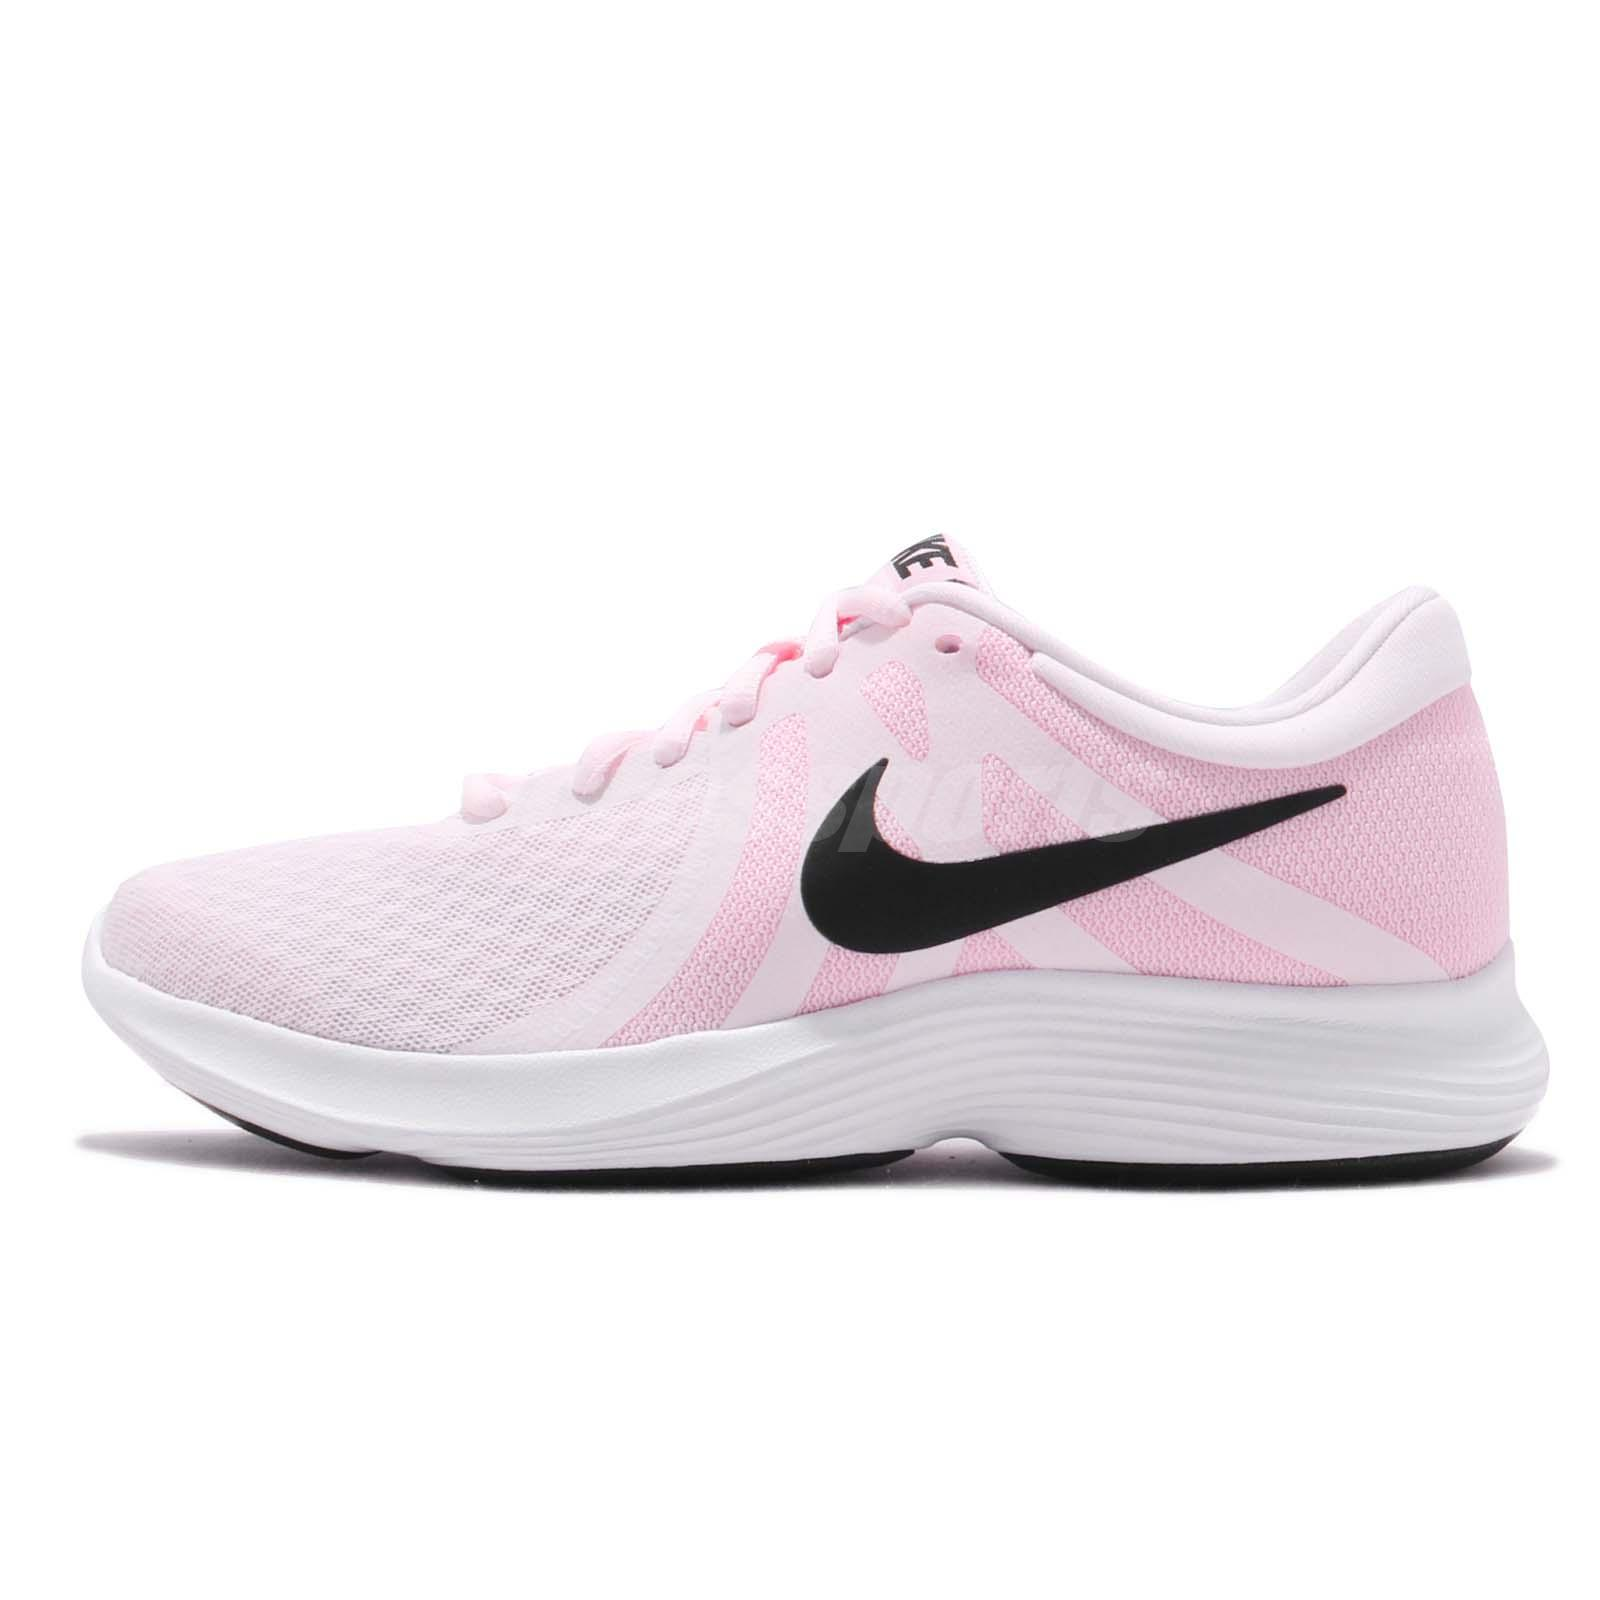 466674e5a5525 Nike Wmns Revolution 4 Pale Pink Black Womens Running Shoes Runner  908999-604